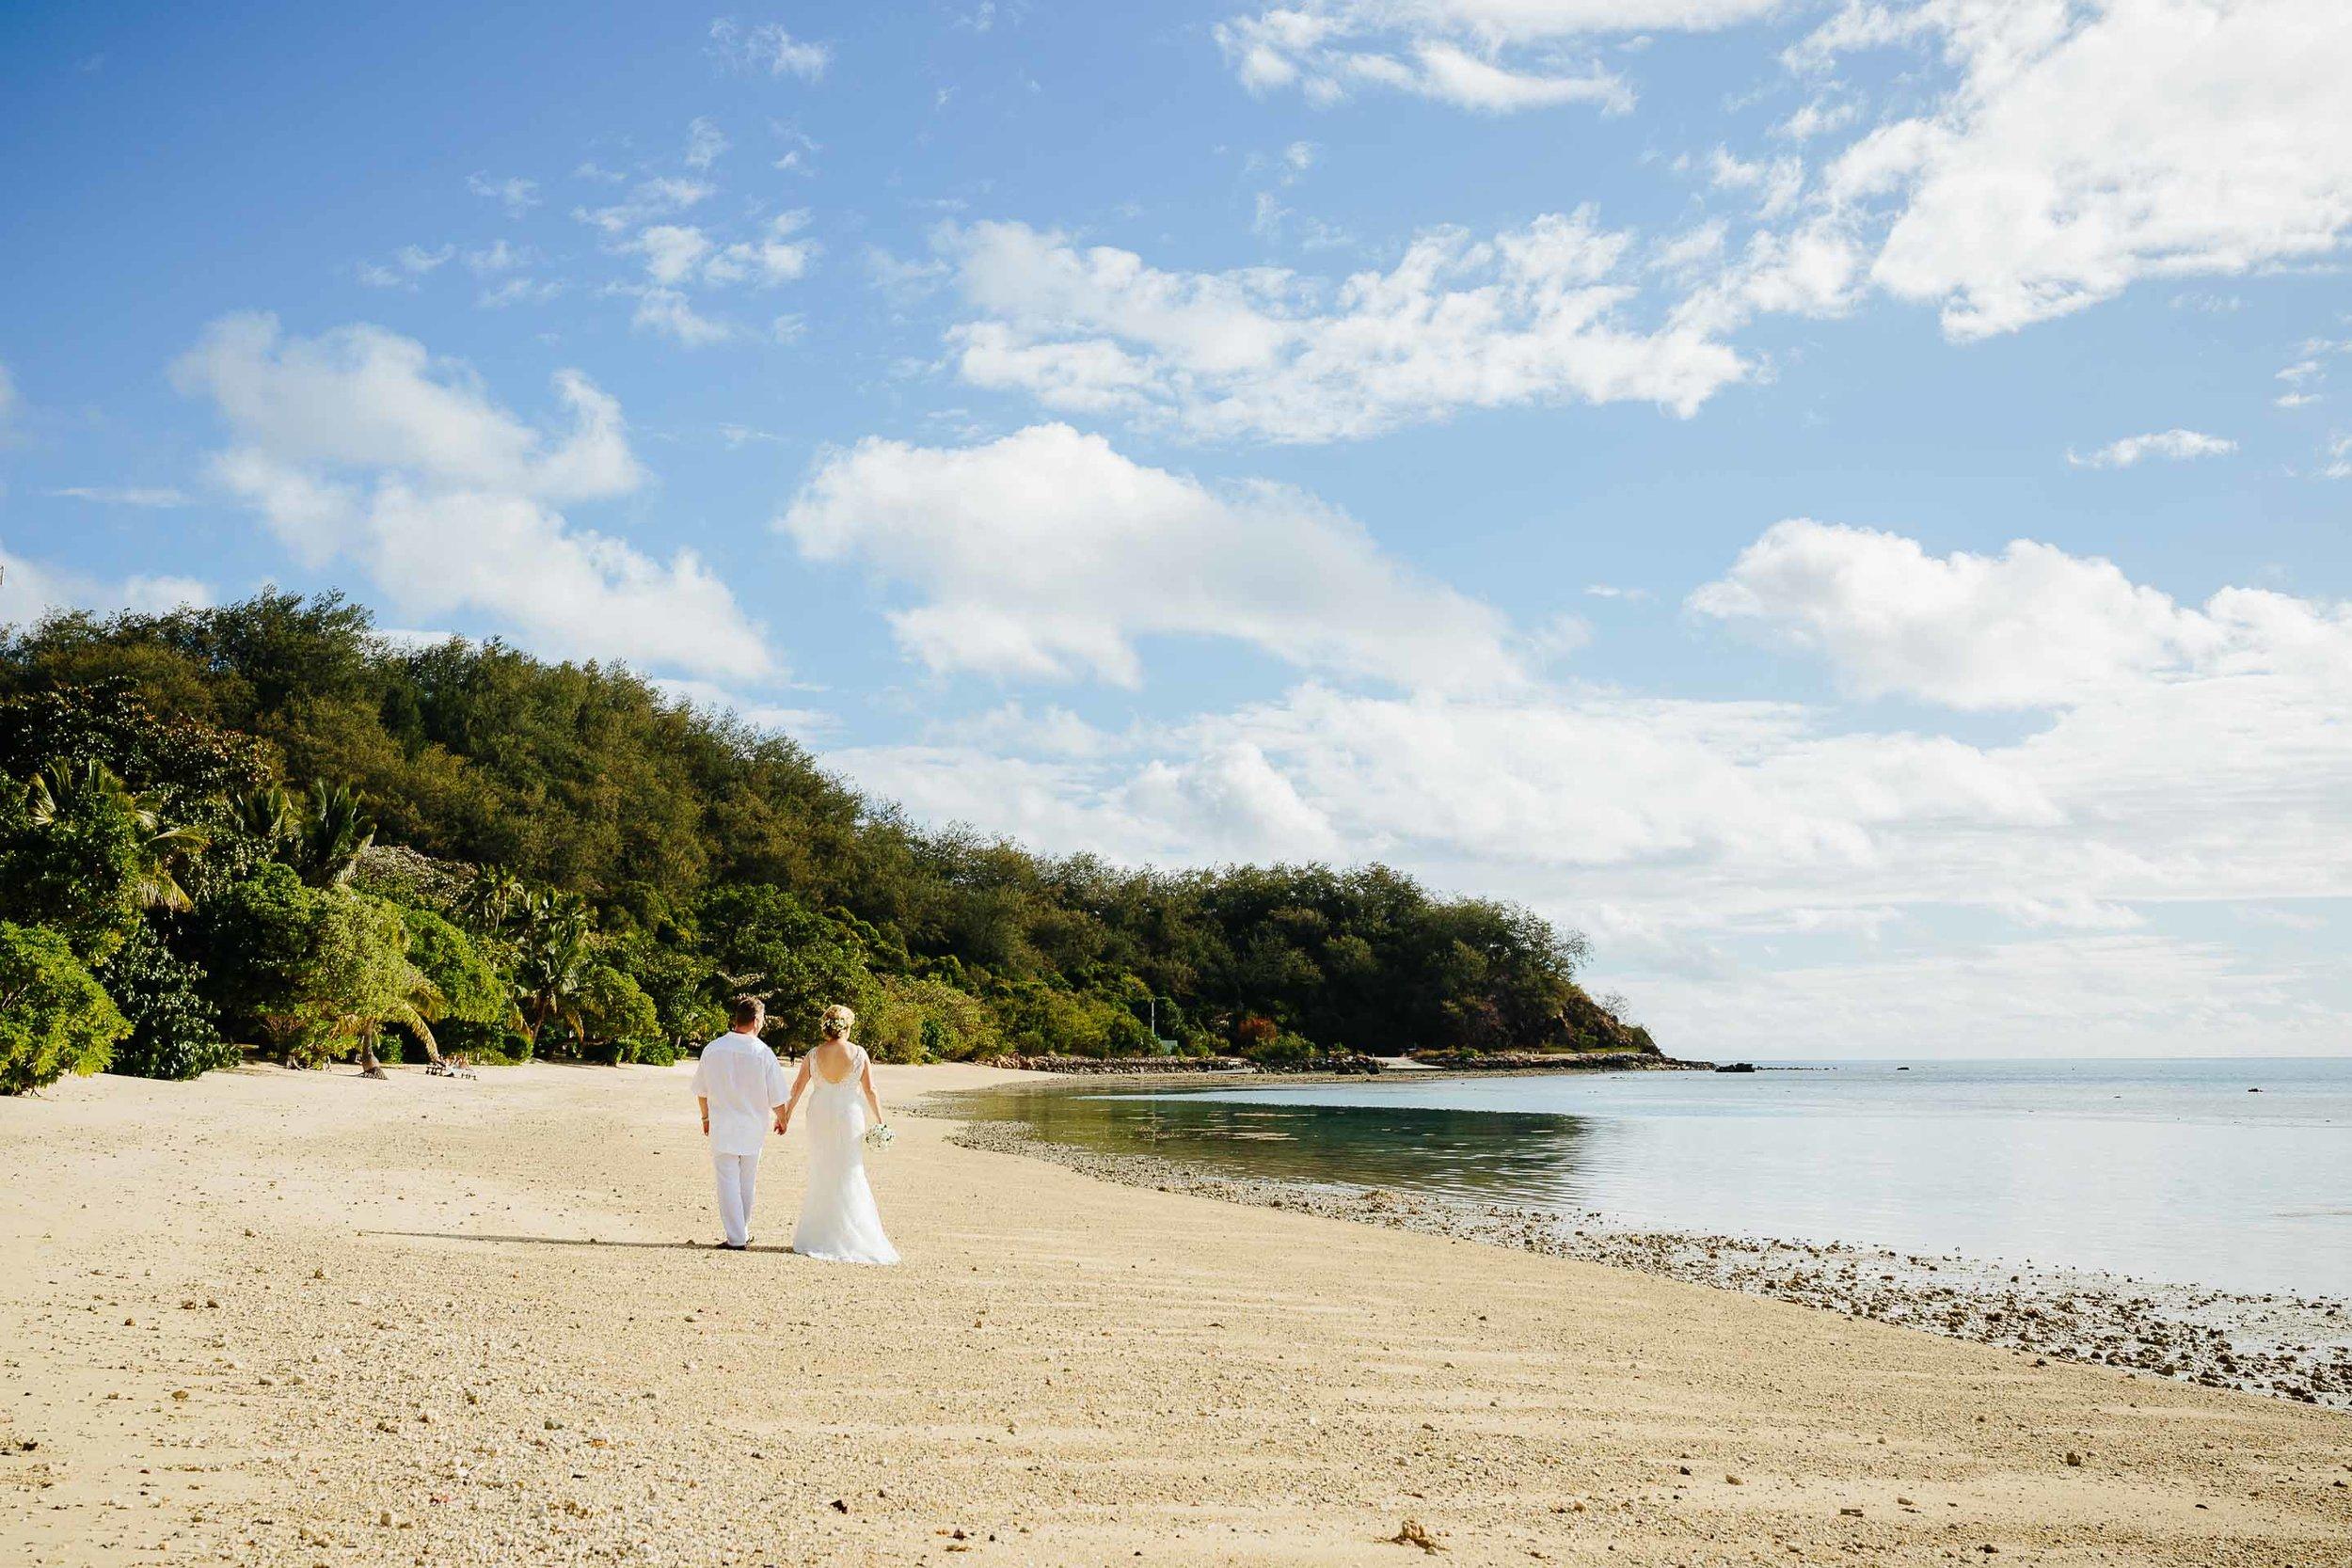 Newlweds walk down the beach in Fiji